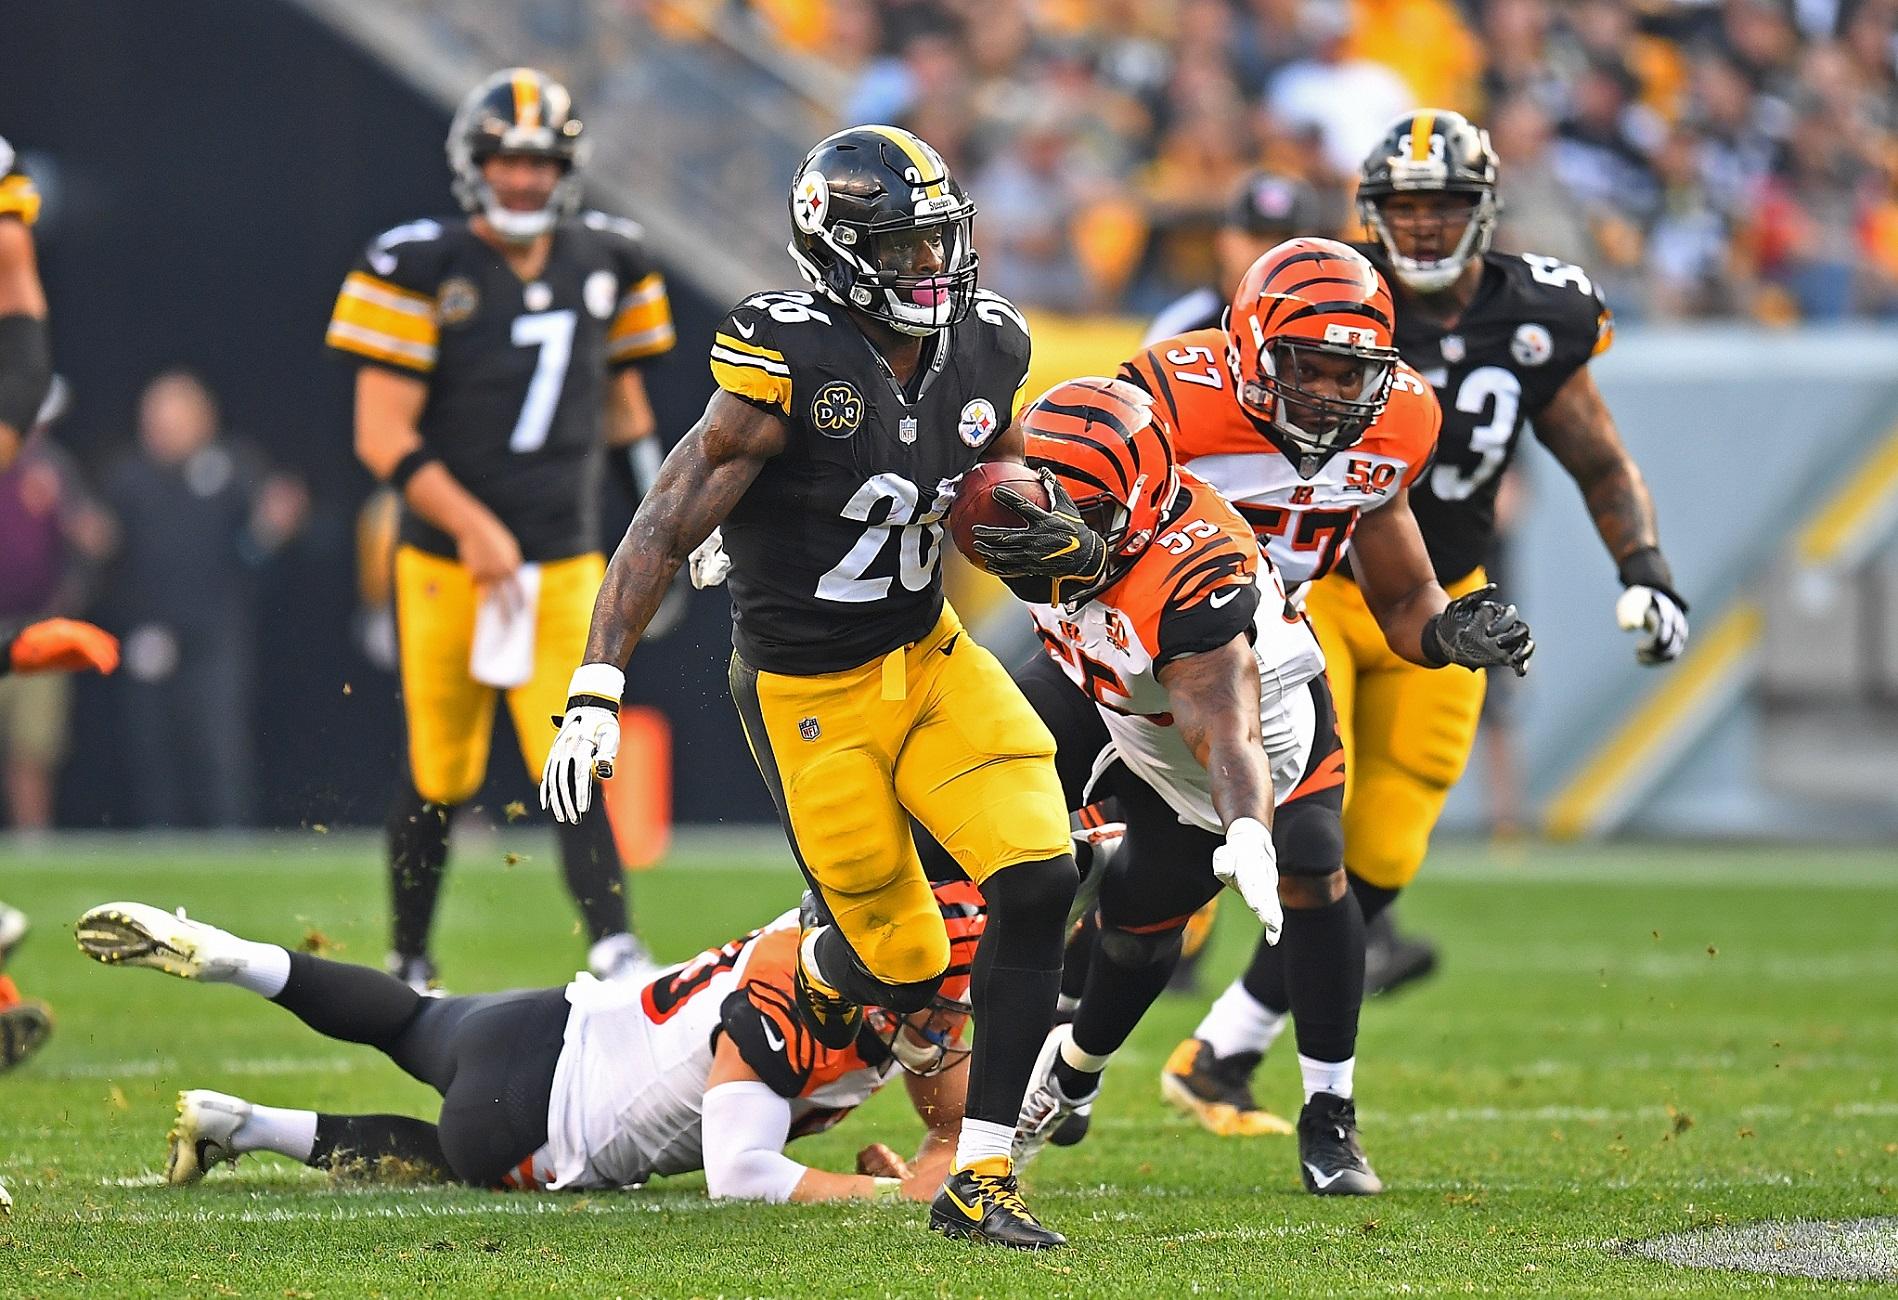 Joe Haden Pittsburgh Steelers LCB NFL and PFF stats